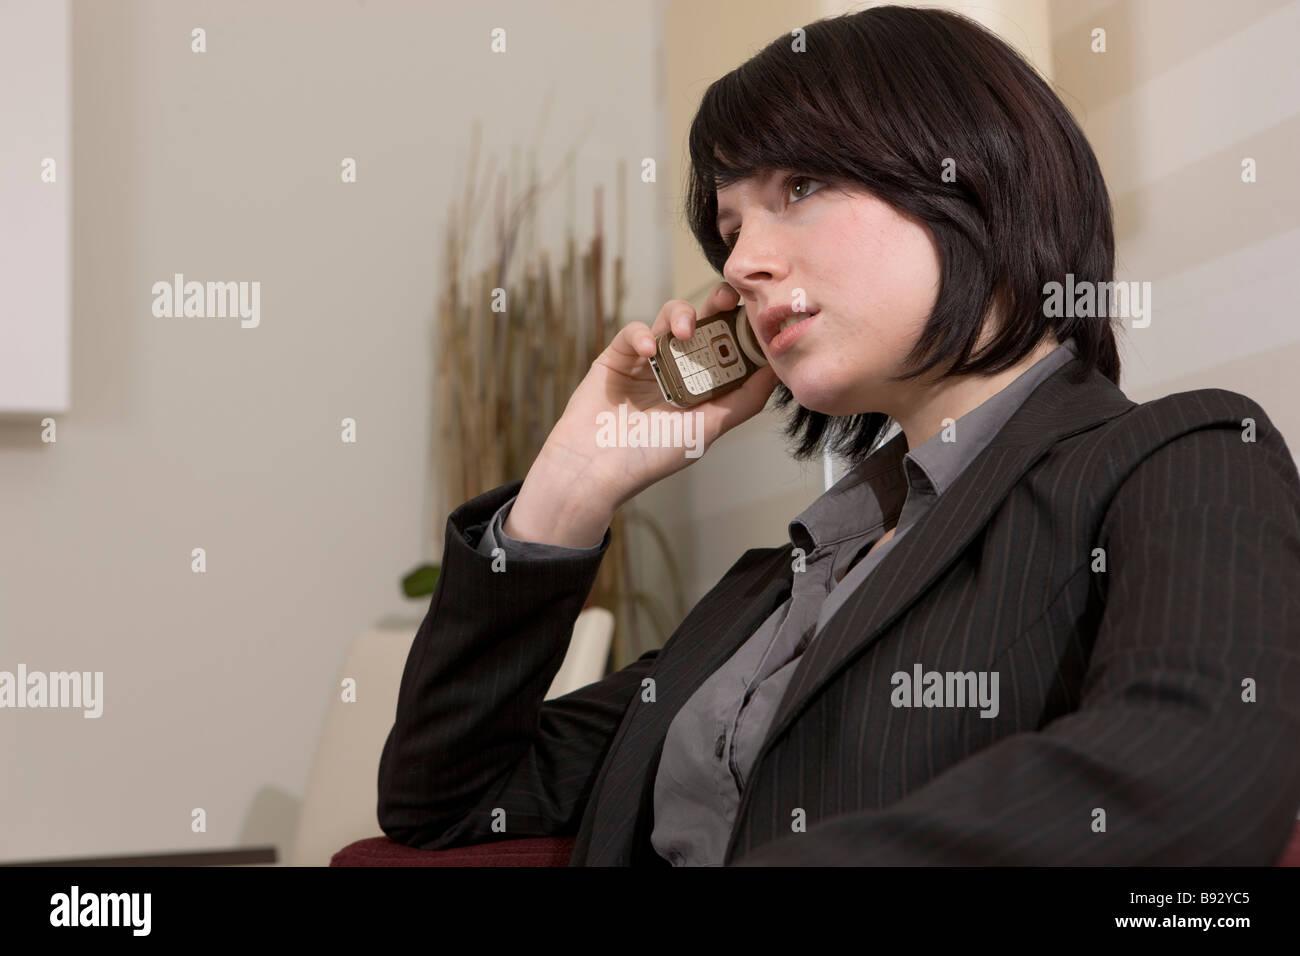 frau im büro oder hotel business - Stock Image